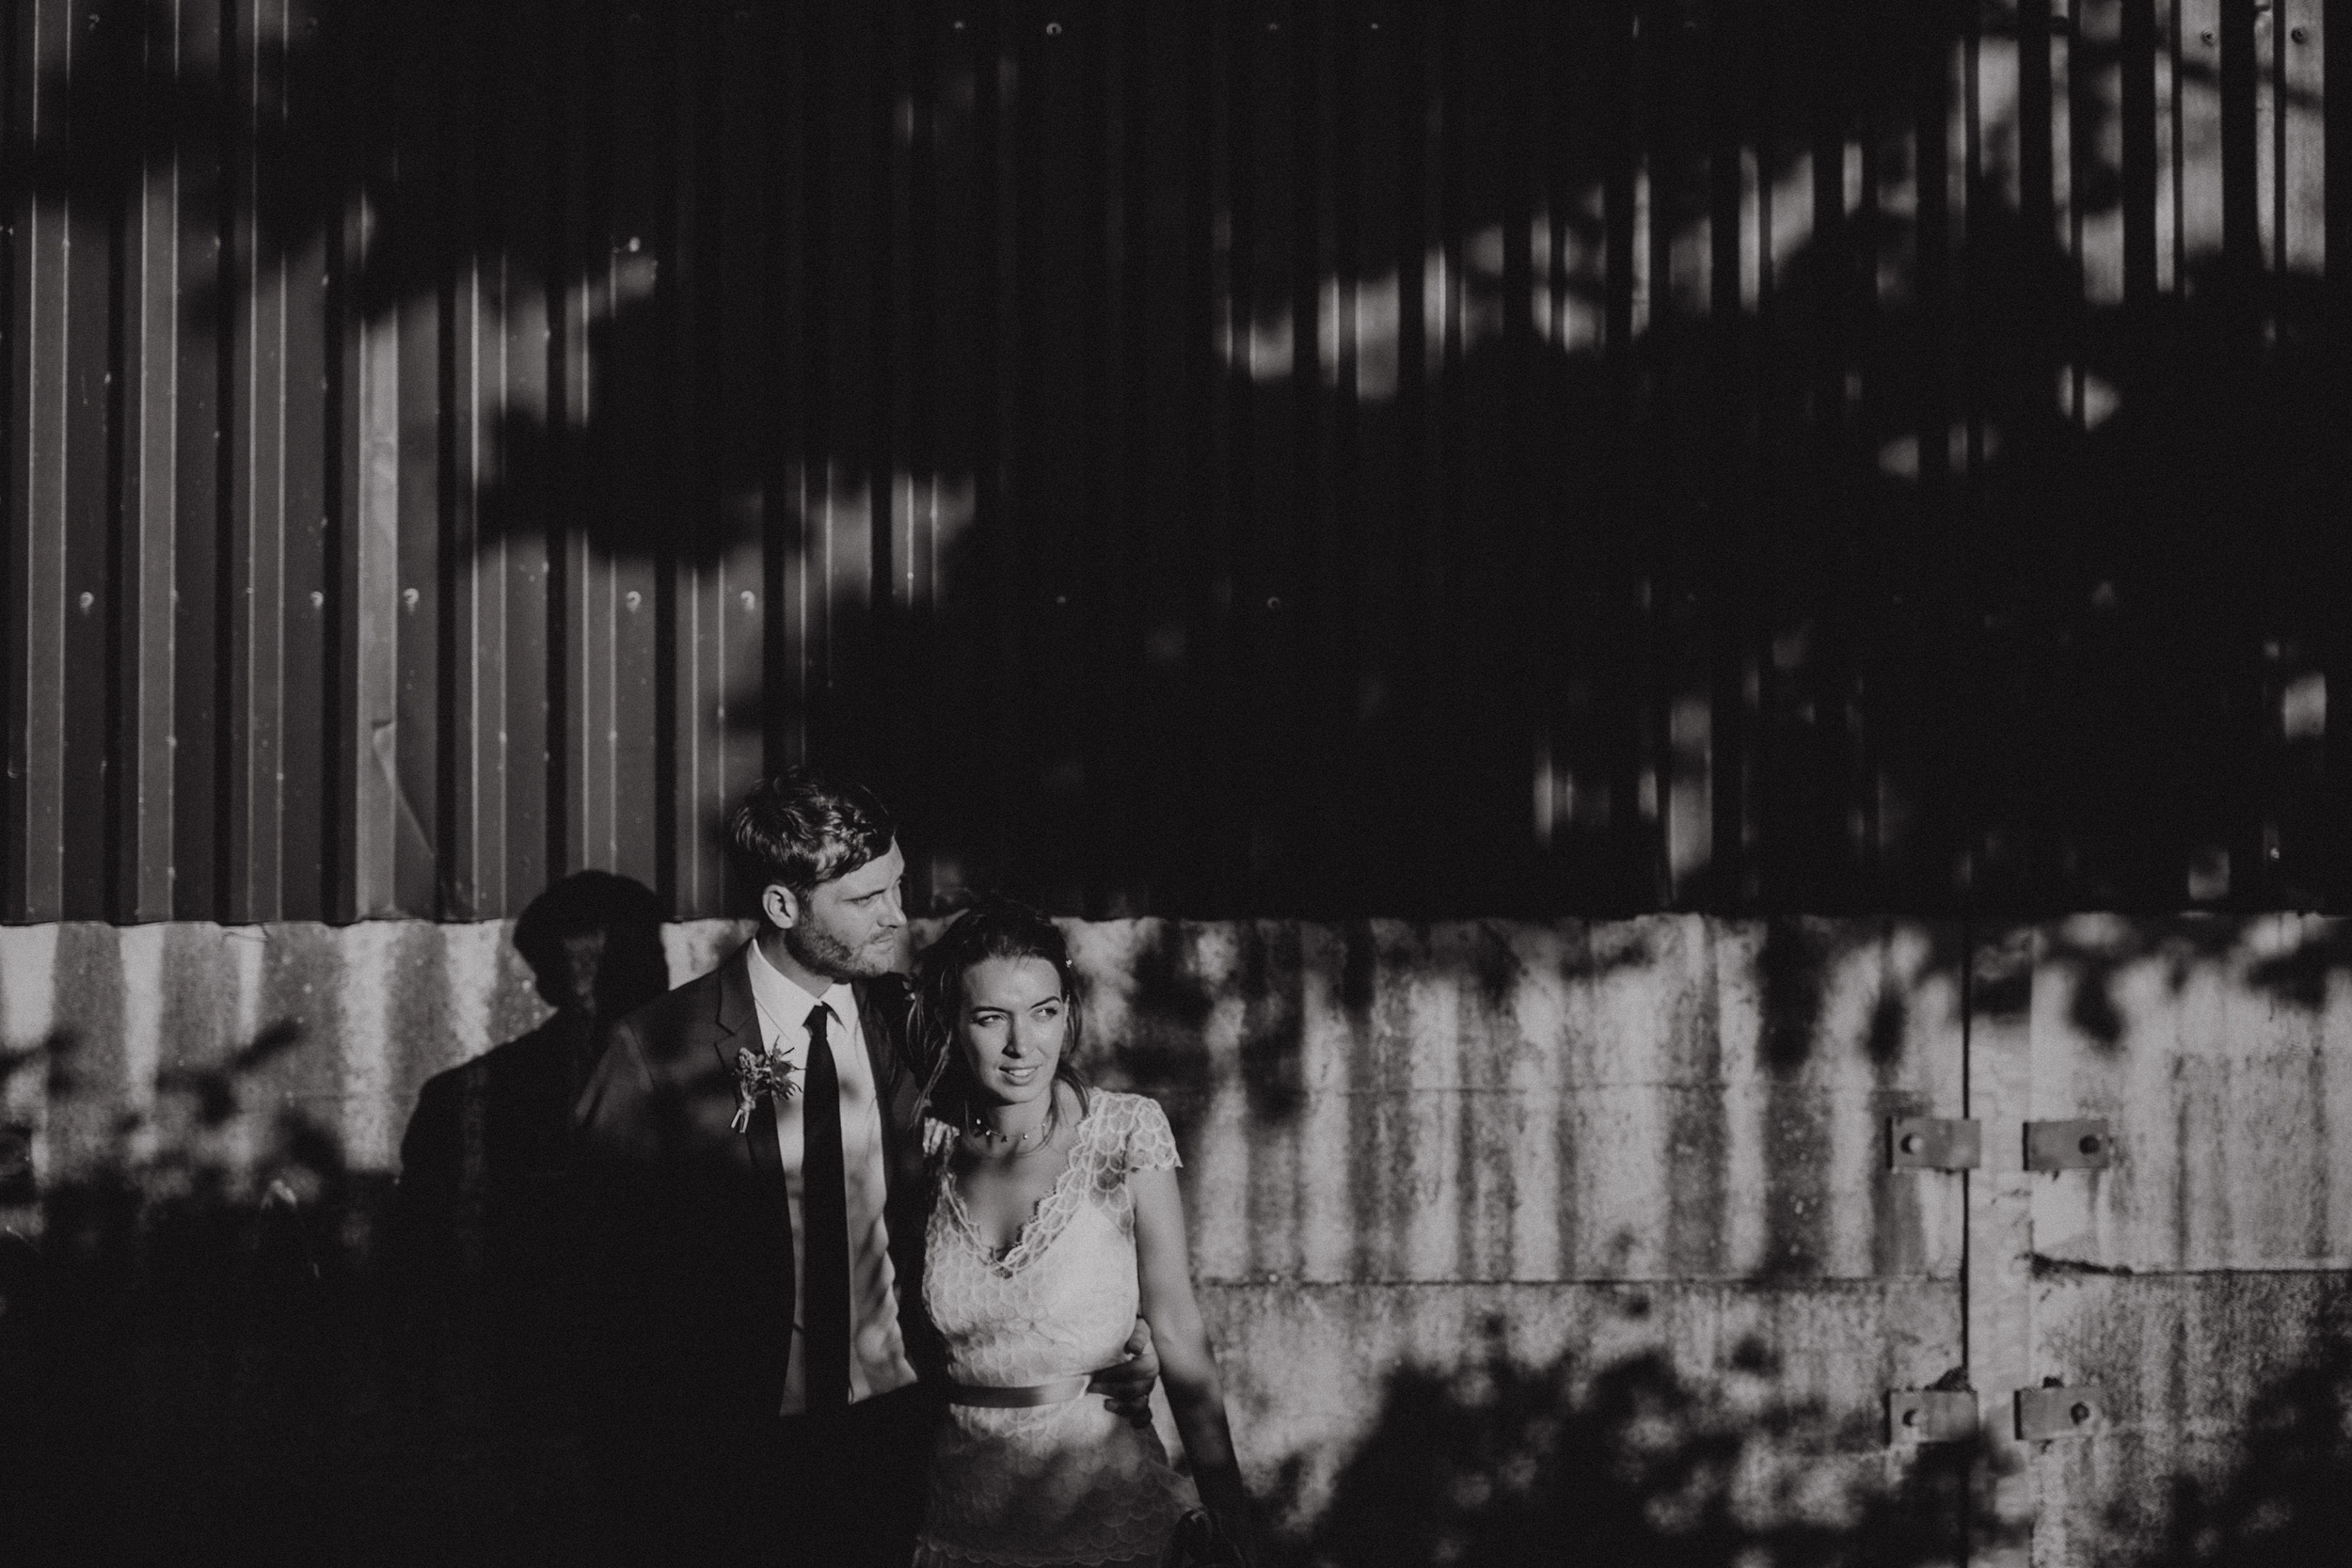 Martha-Laid-Back-Garden-Wedding-Lace-Wedding-Dress-Bohemian-Kate-Beaumont-53.jpg